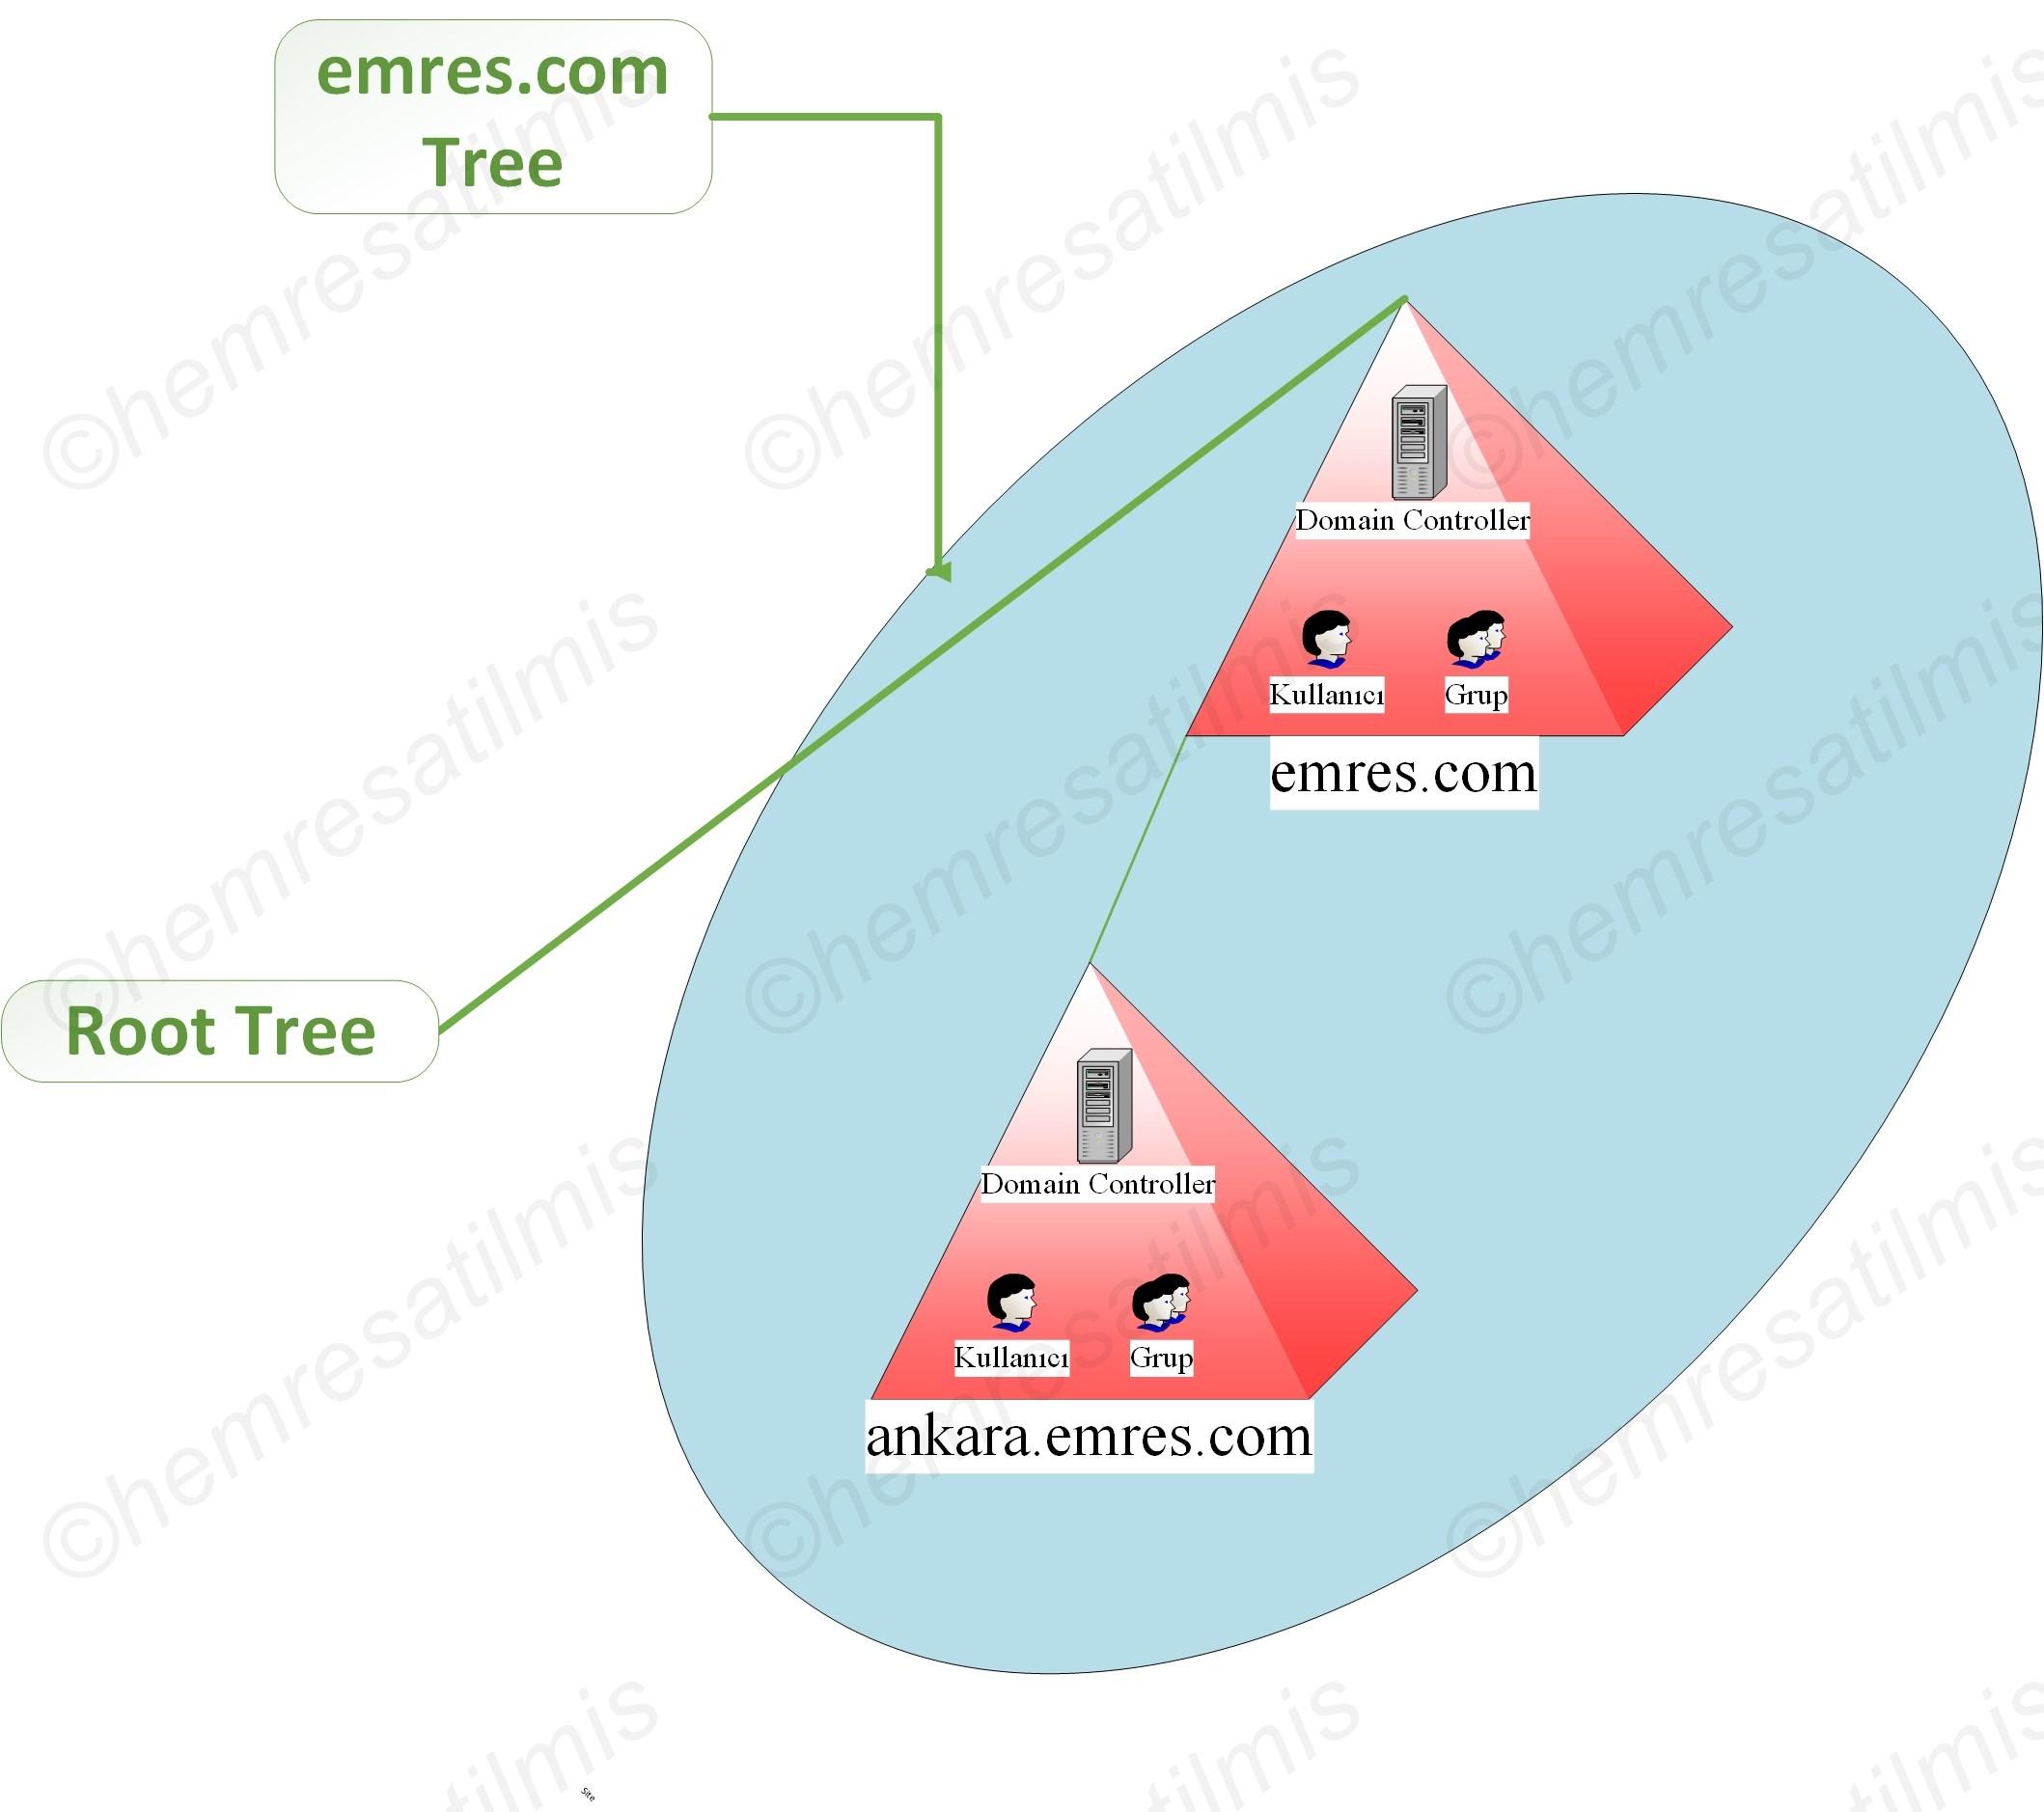 Active Directoryde Forest ve Tree - 02